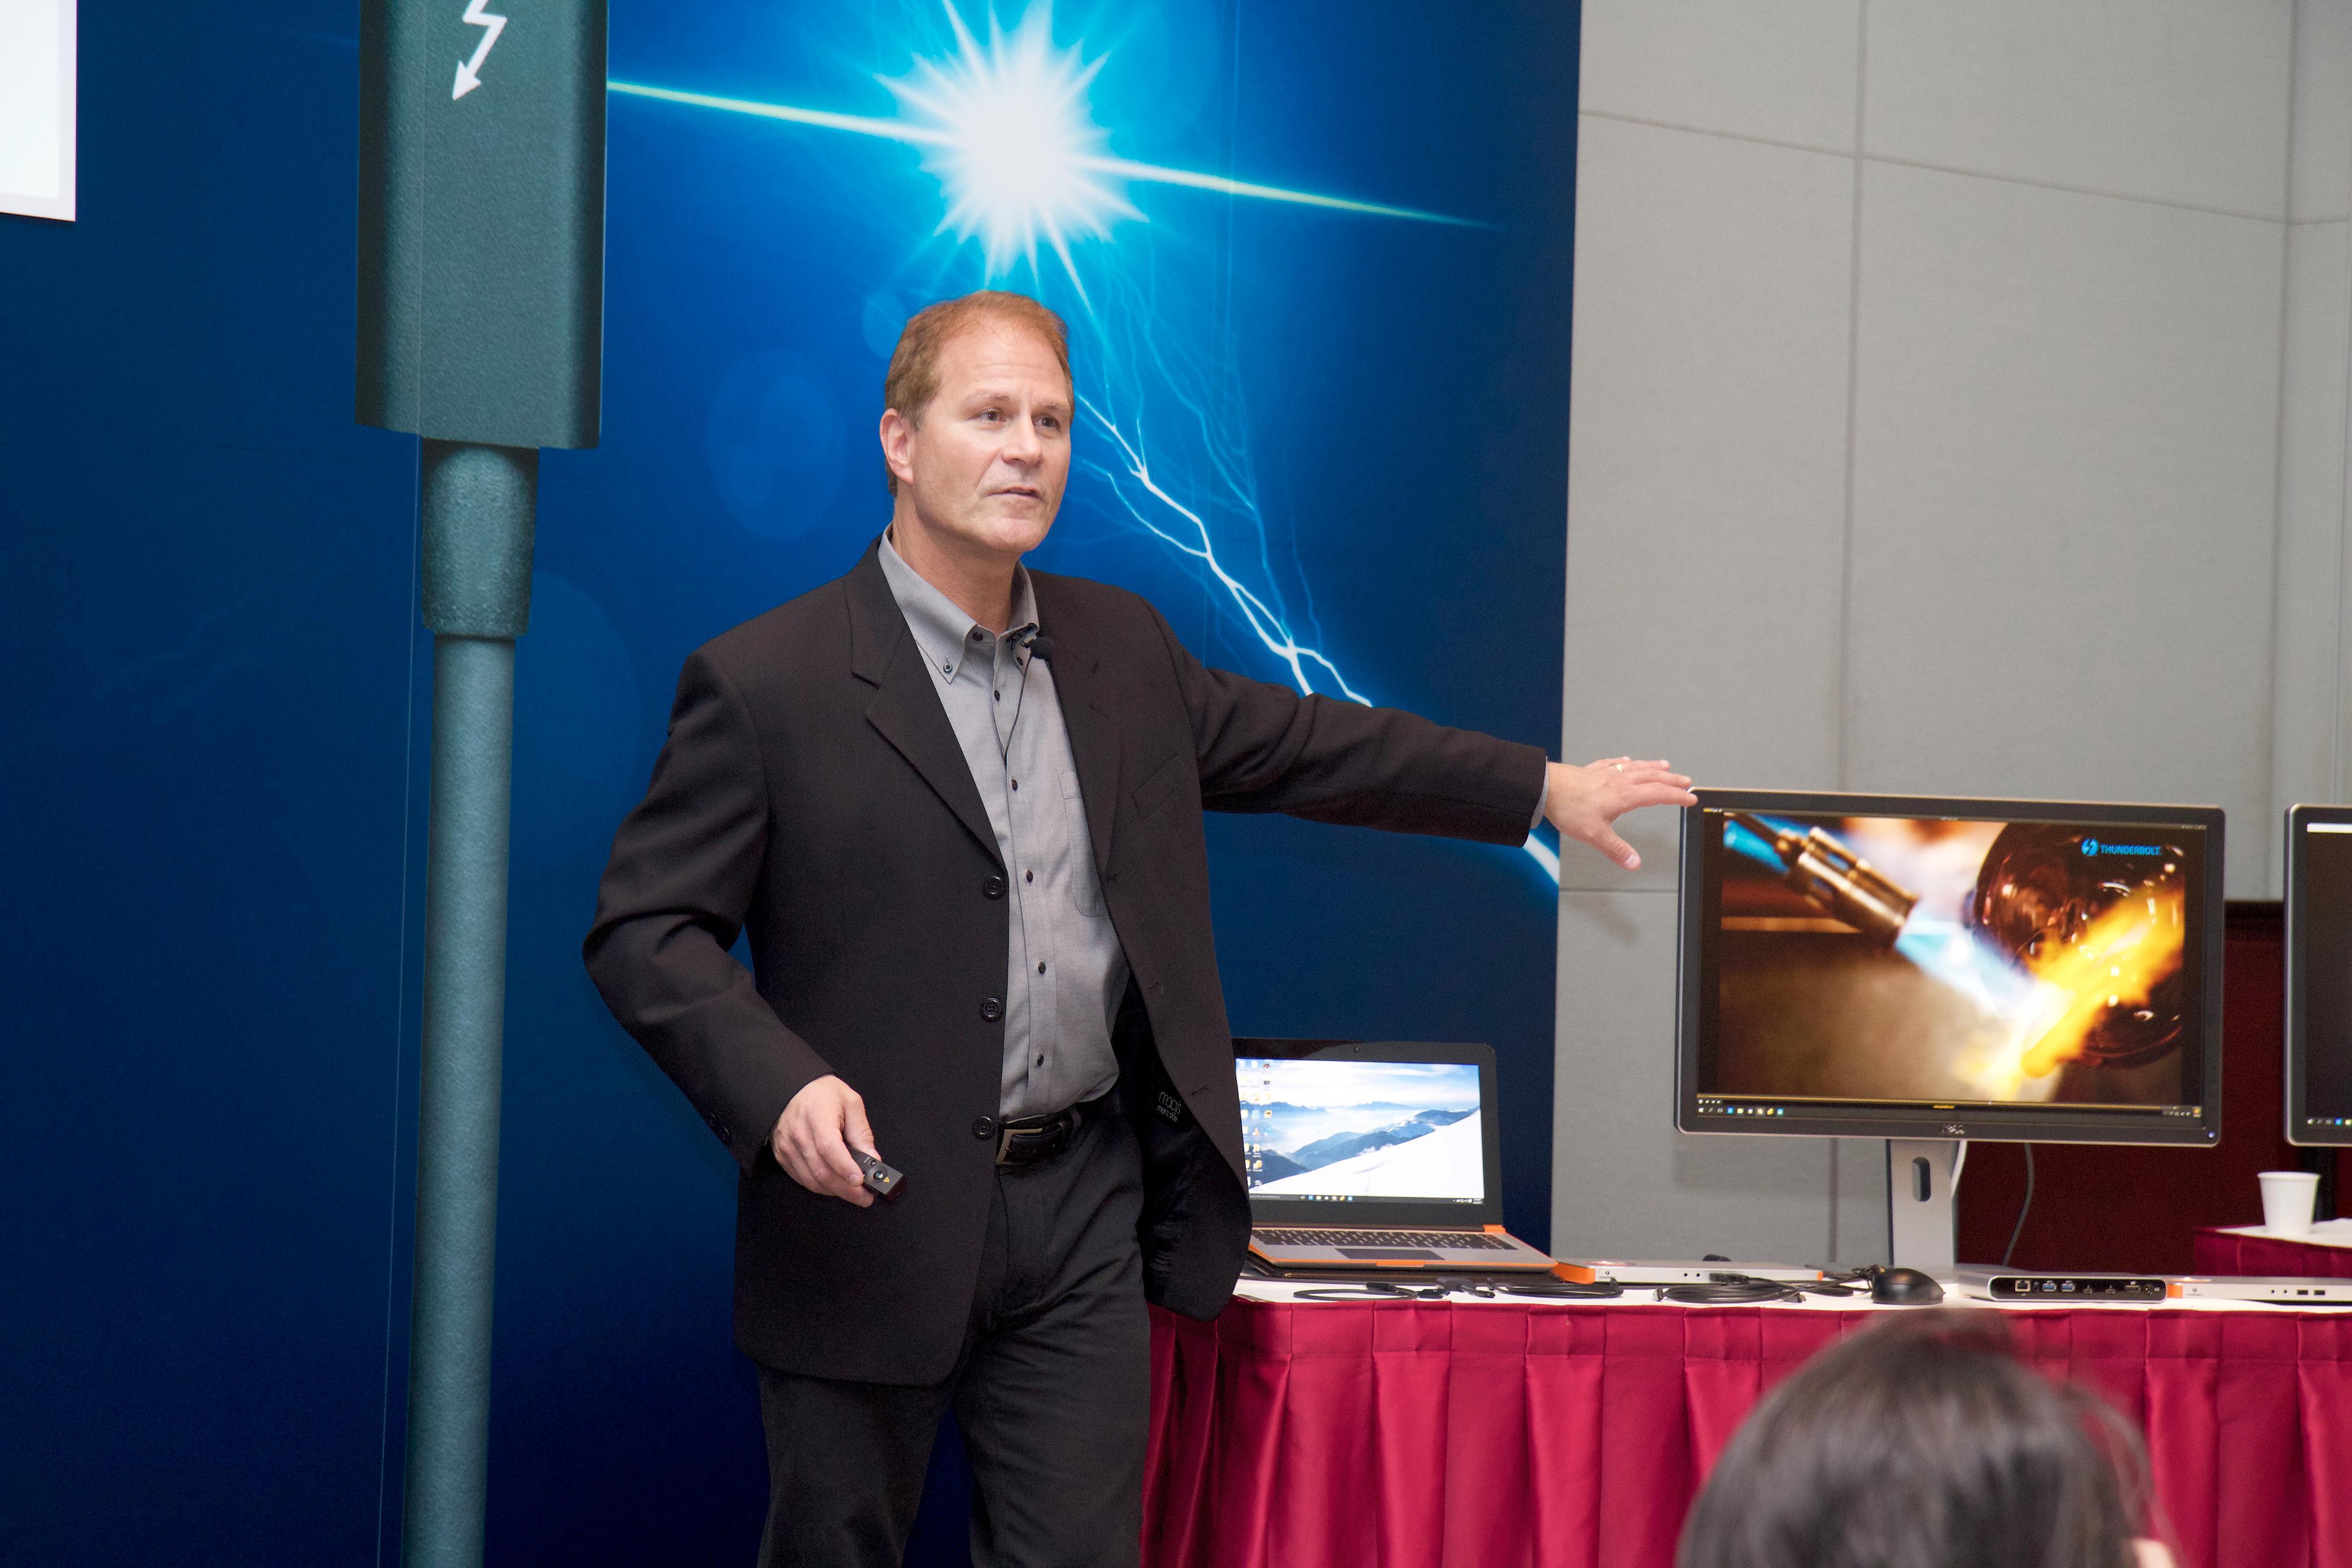 Markedssjef for Thunderbolt, Jason Ziller, i Intel. Foto: Kurt Lekanger, Tek.no